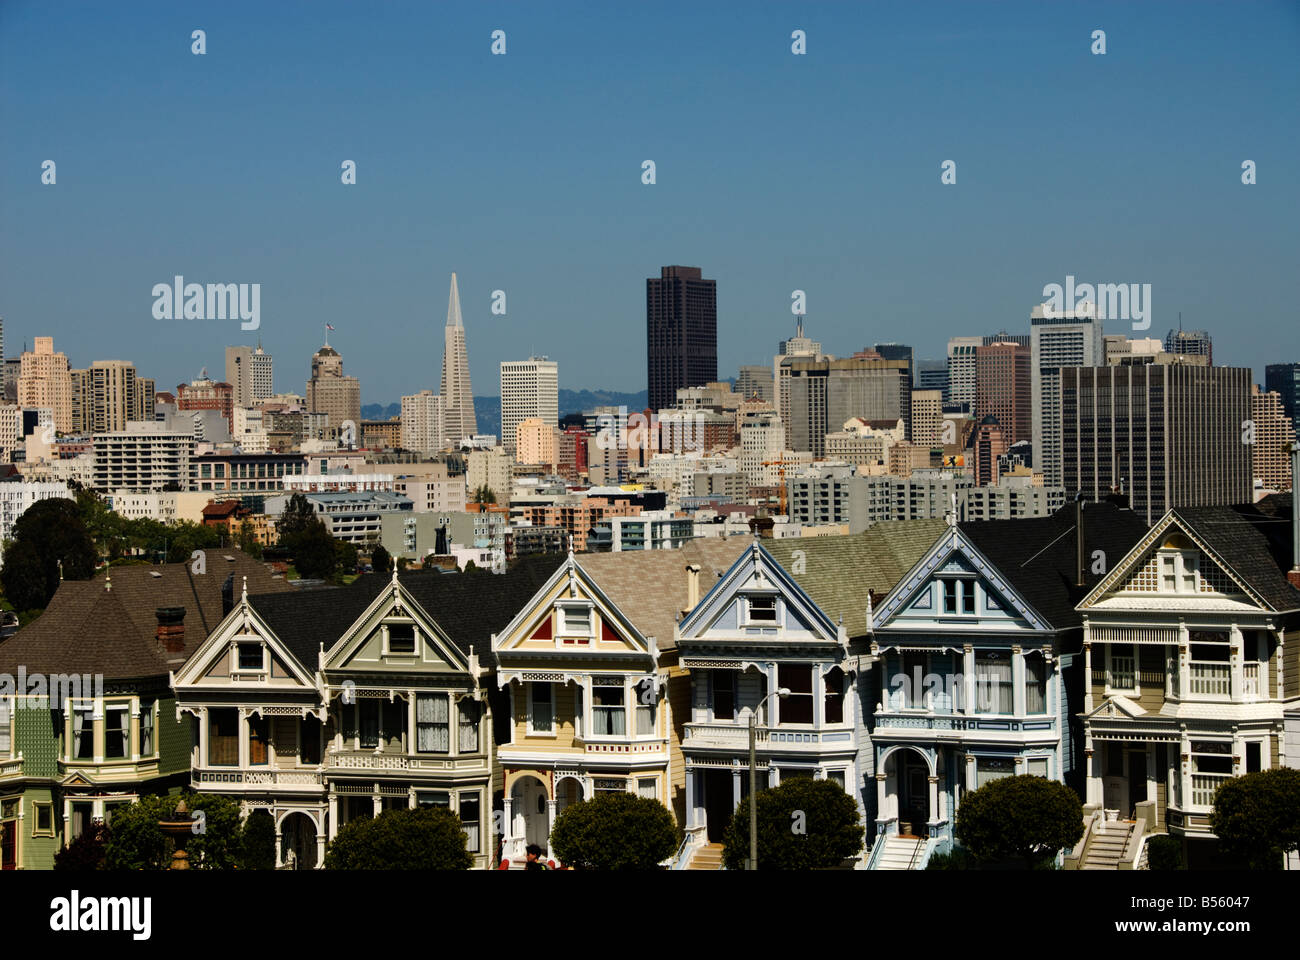 California San Francisco Alamo Square Victorians juxtaposed against the downtown San Francisco skyline. - Stock Image